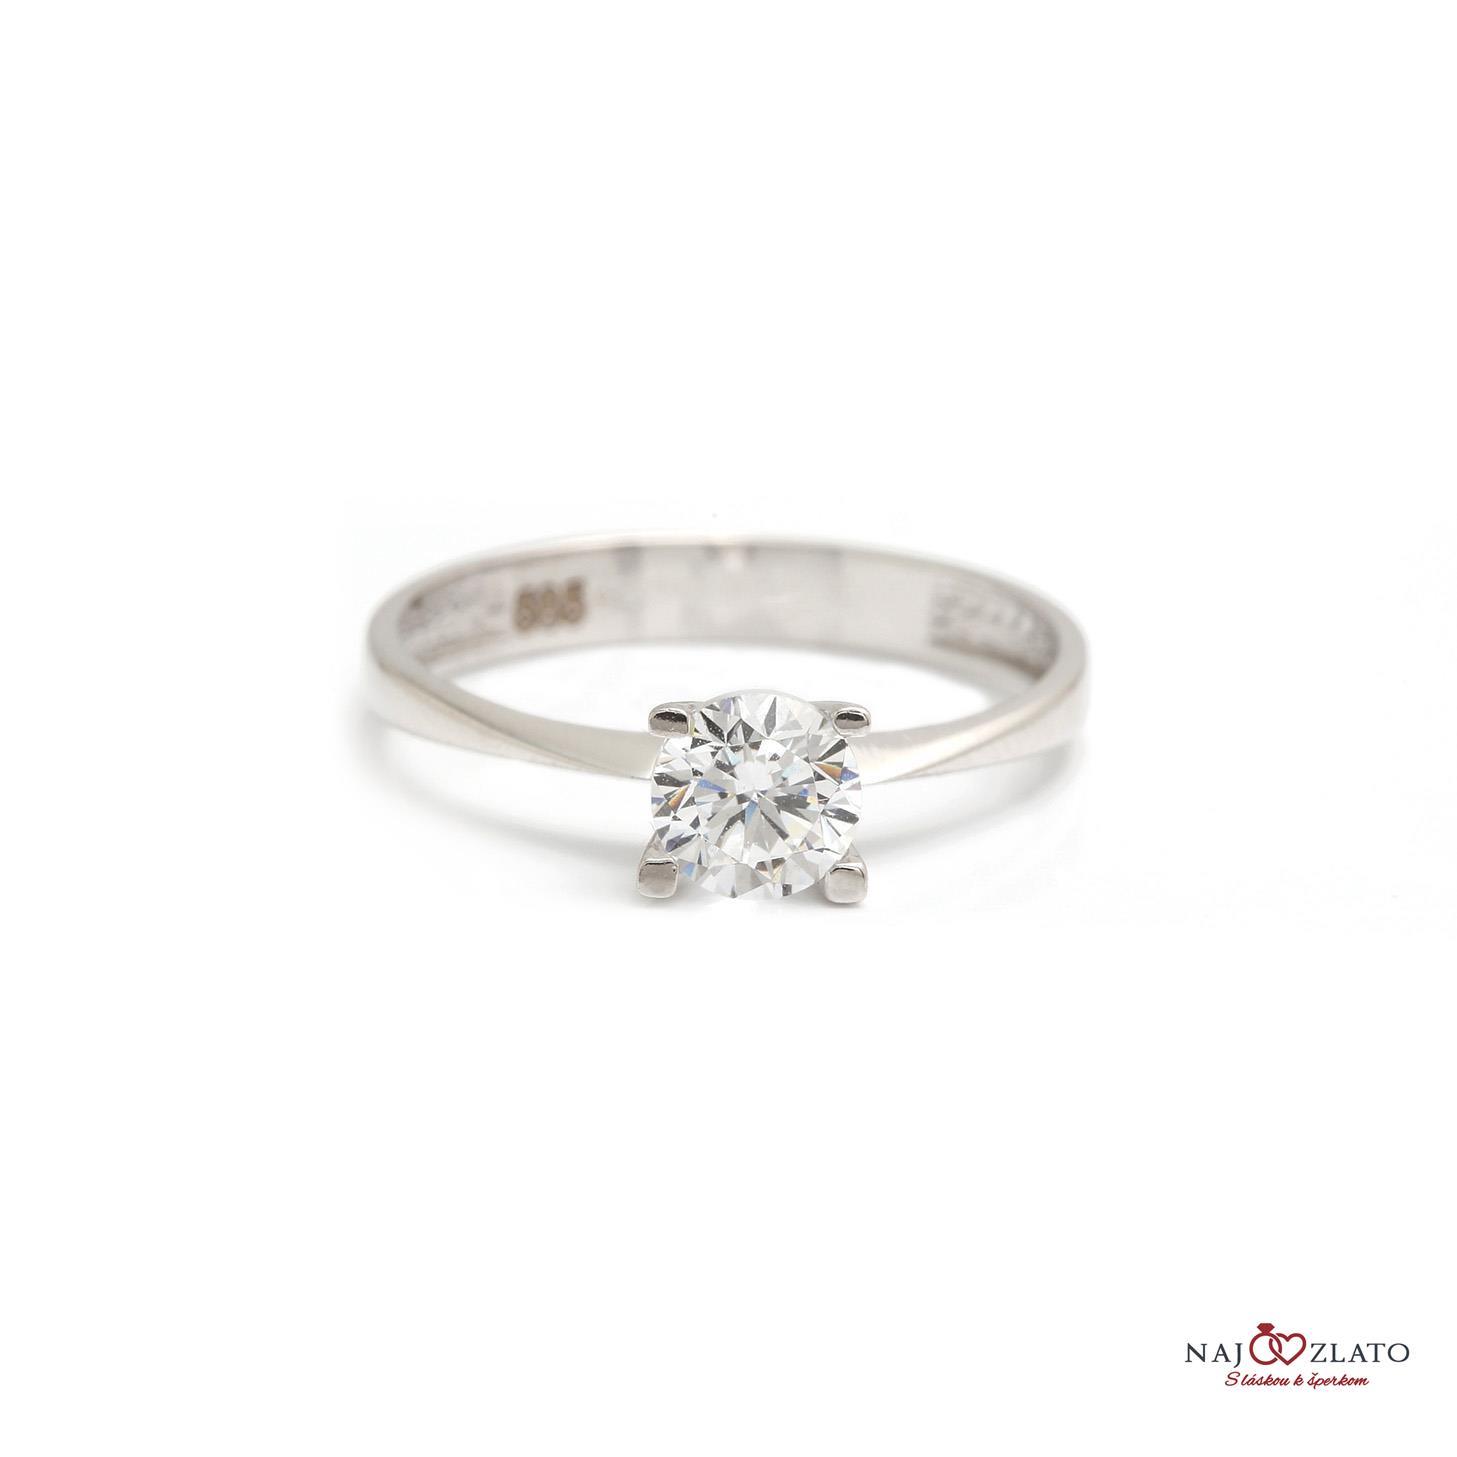 zlatý zásnubný prsteň lurdes zlatý zásnubný prsteň lurdes 1 ... 16b3528138c